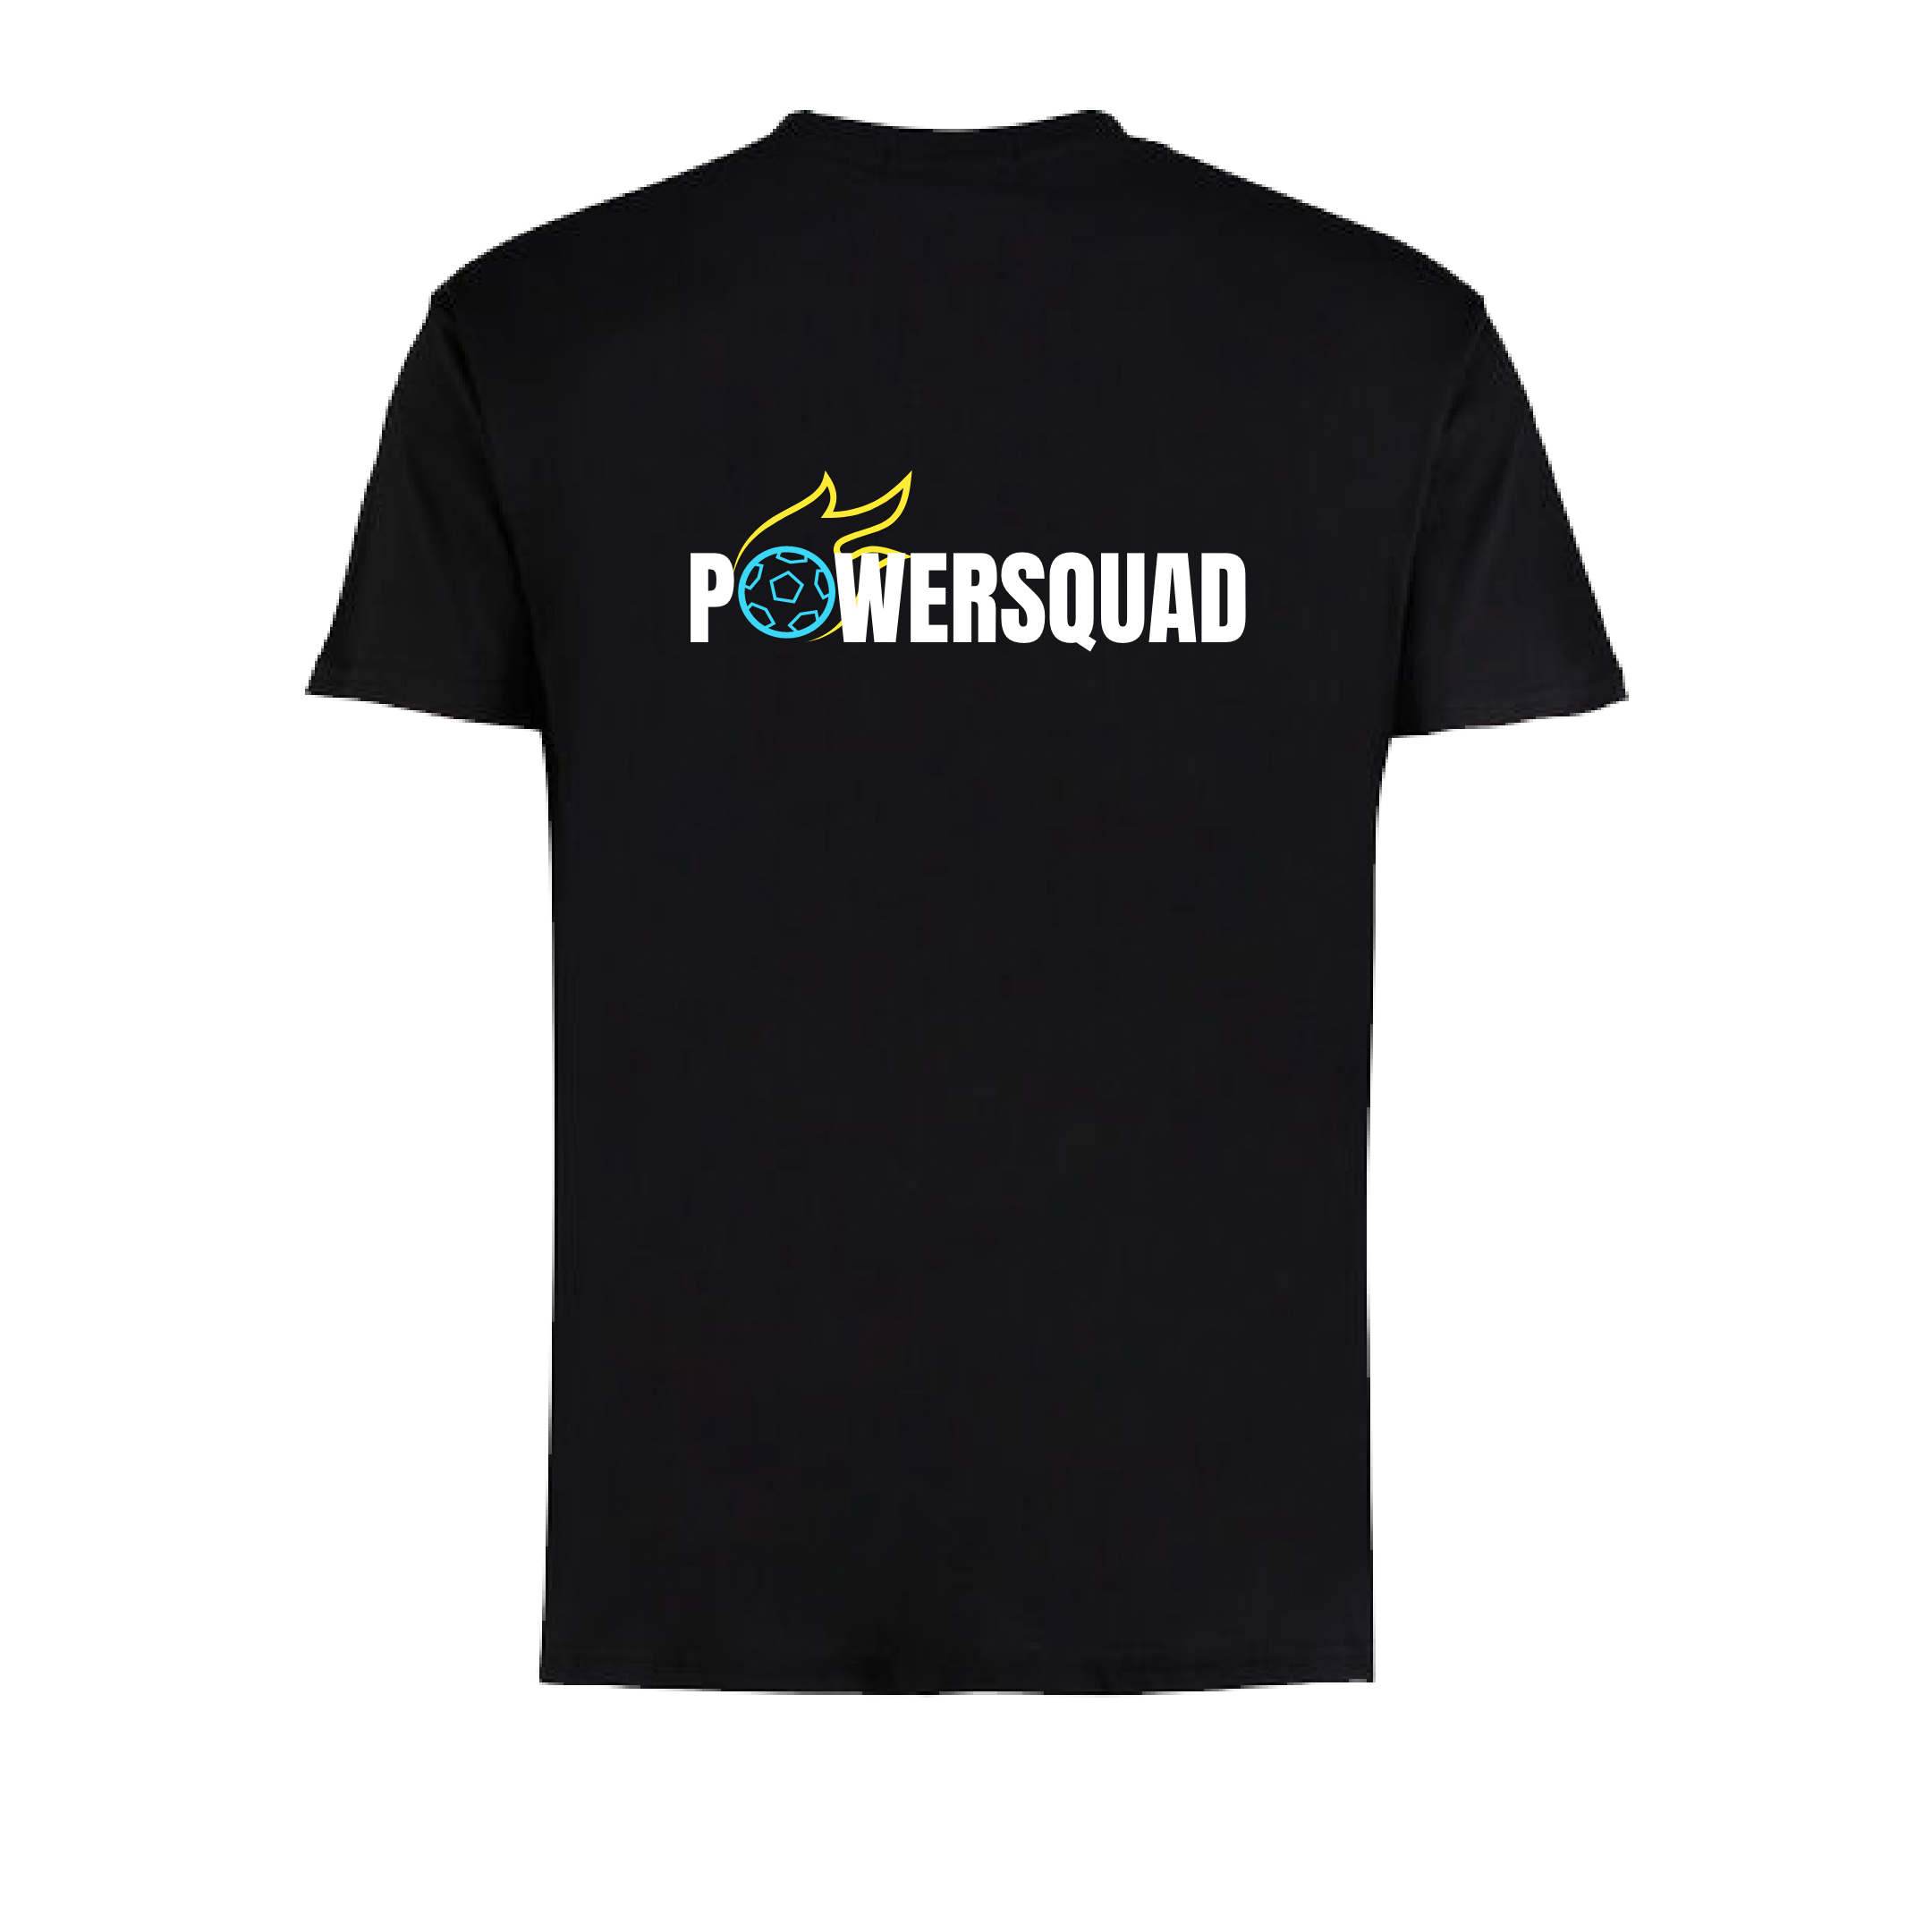 Goal Power - POWERSQUAD (back) - Yellow & Blue – 1@2x